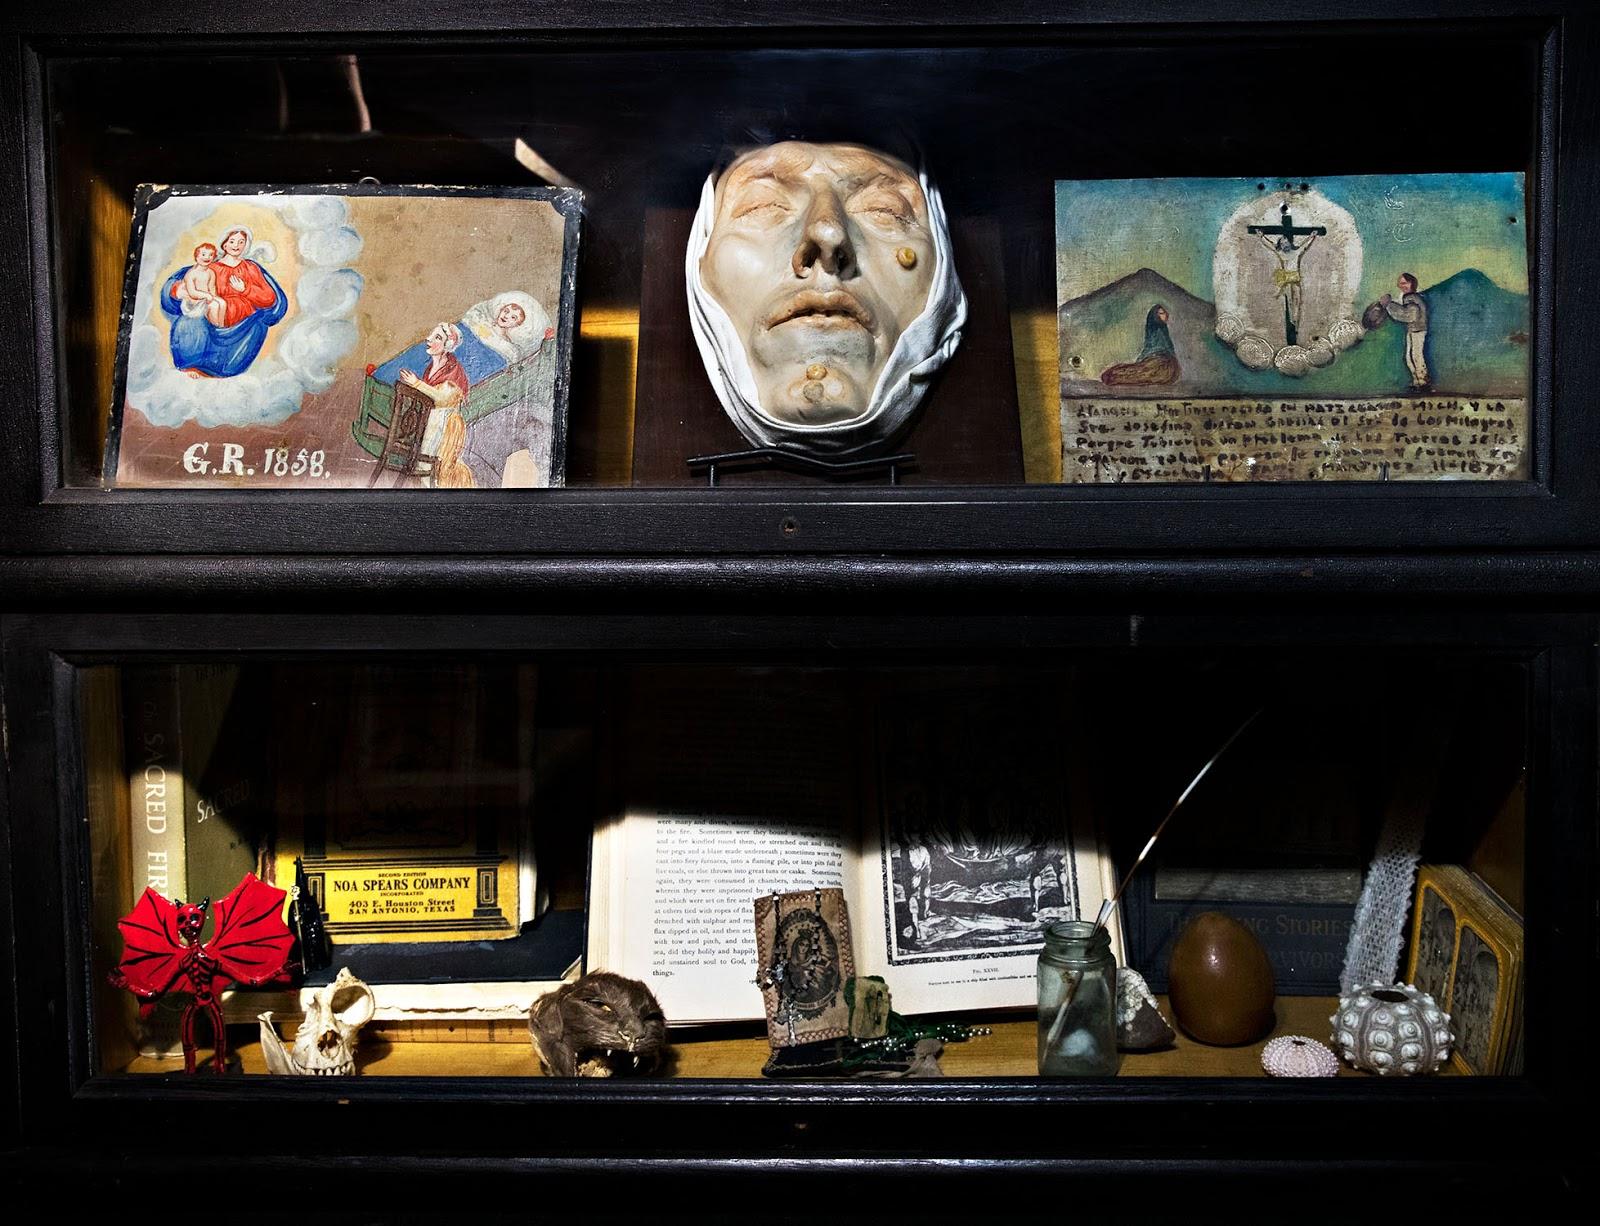 Morbid Anatomy The Morbid Anatomy Library